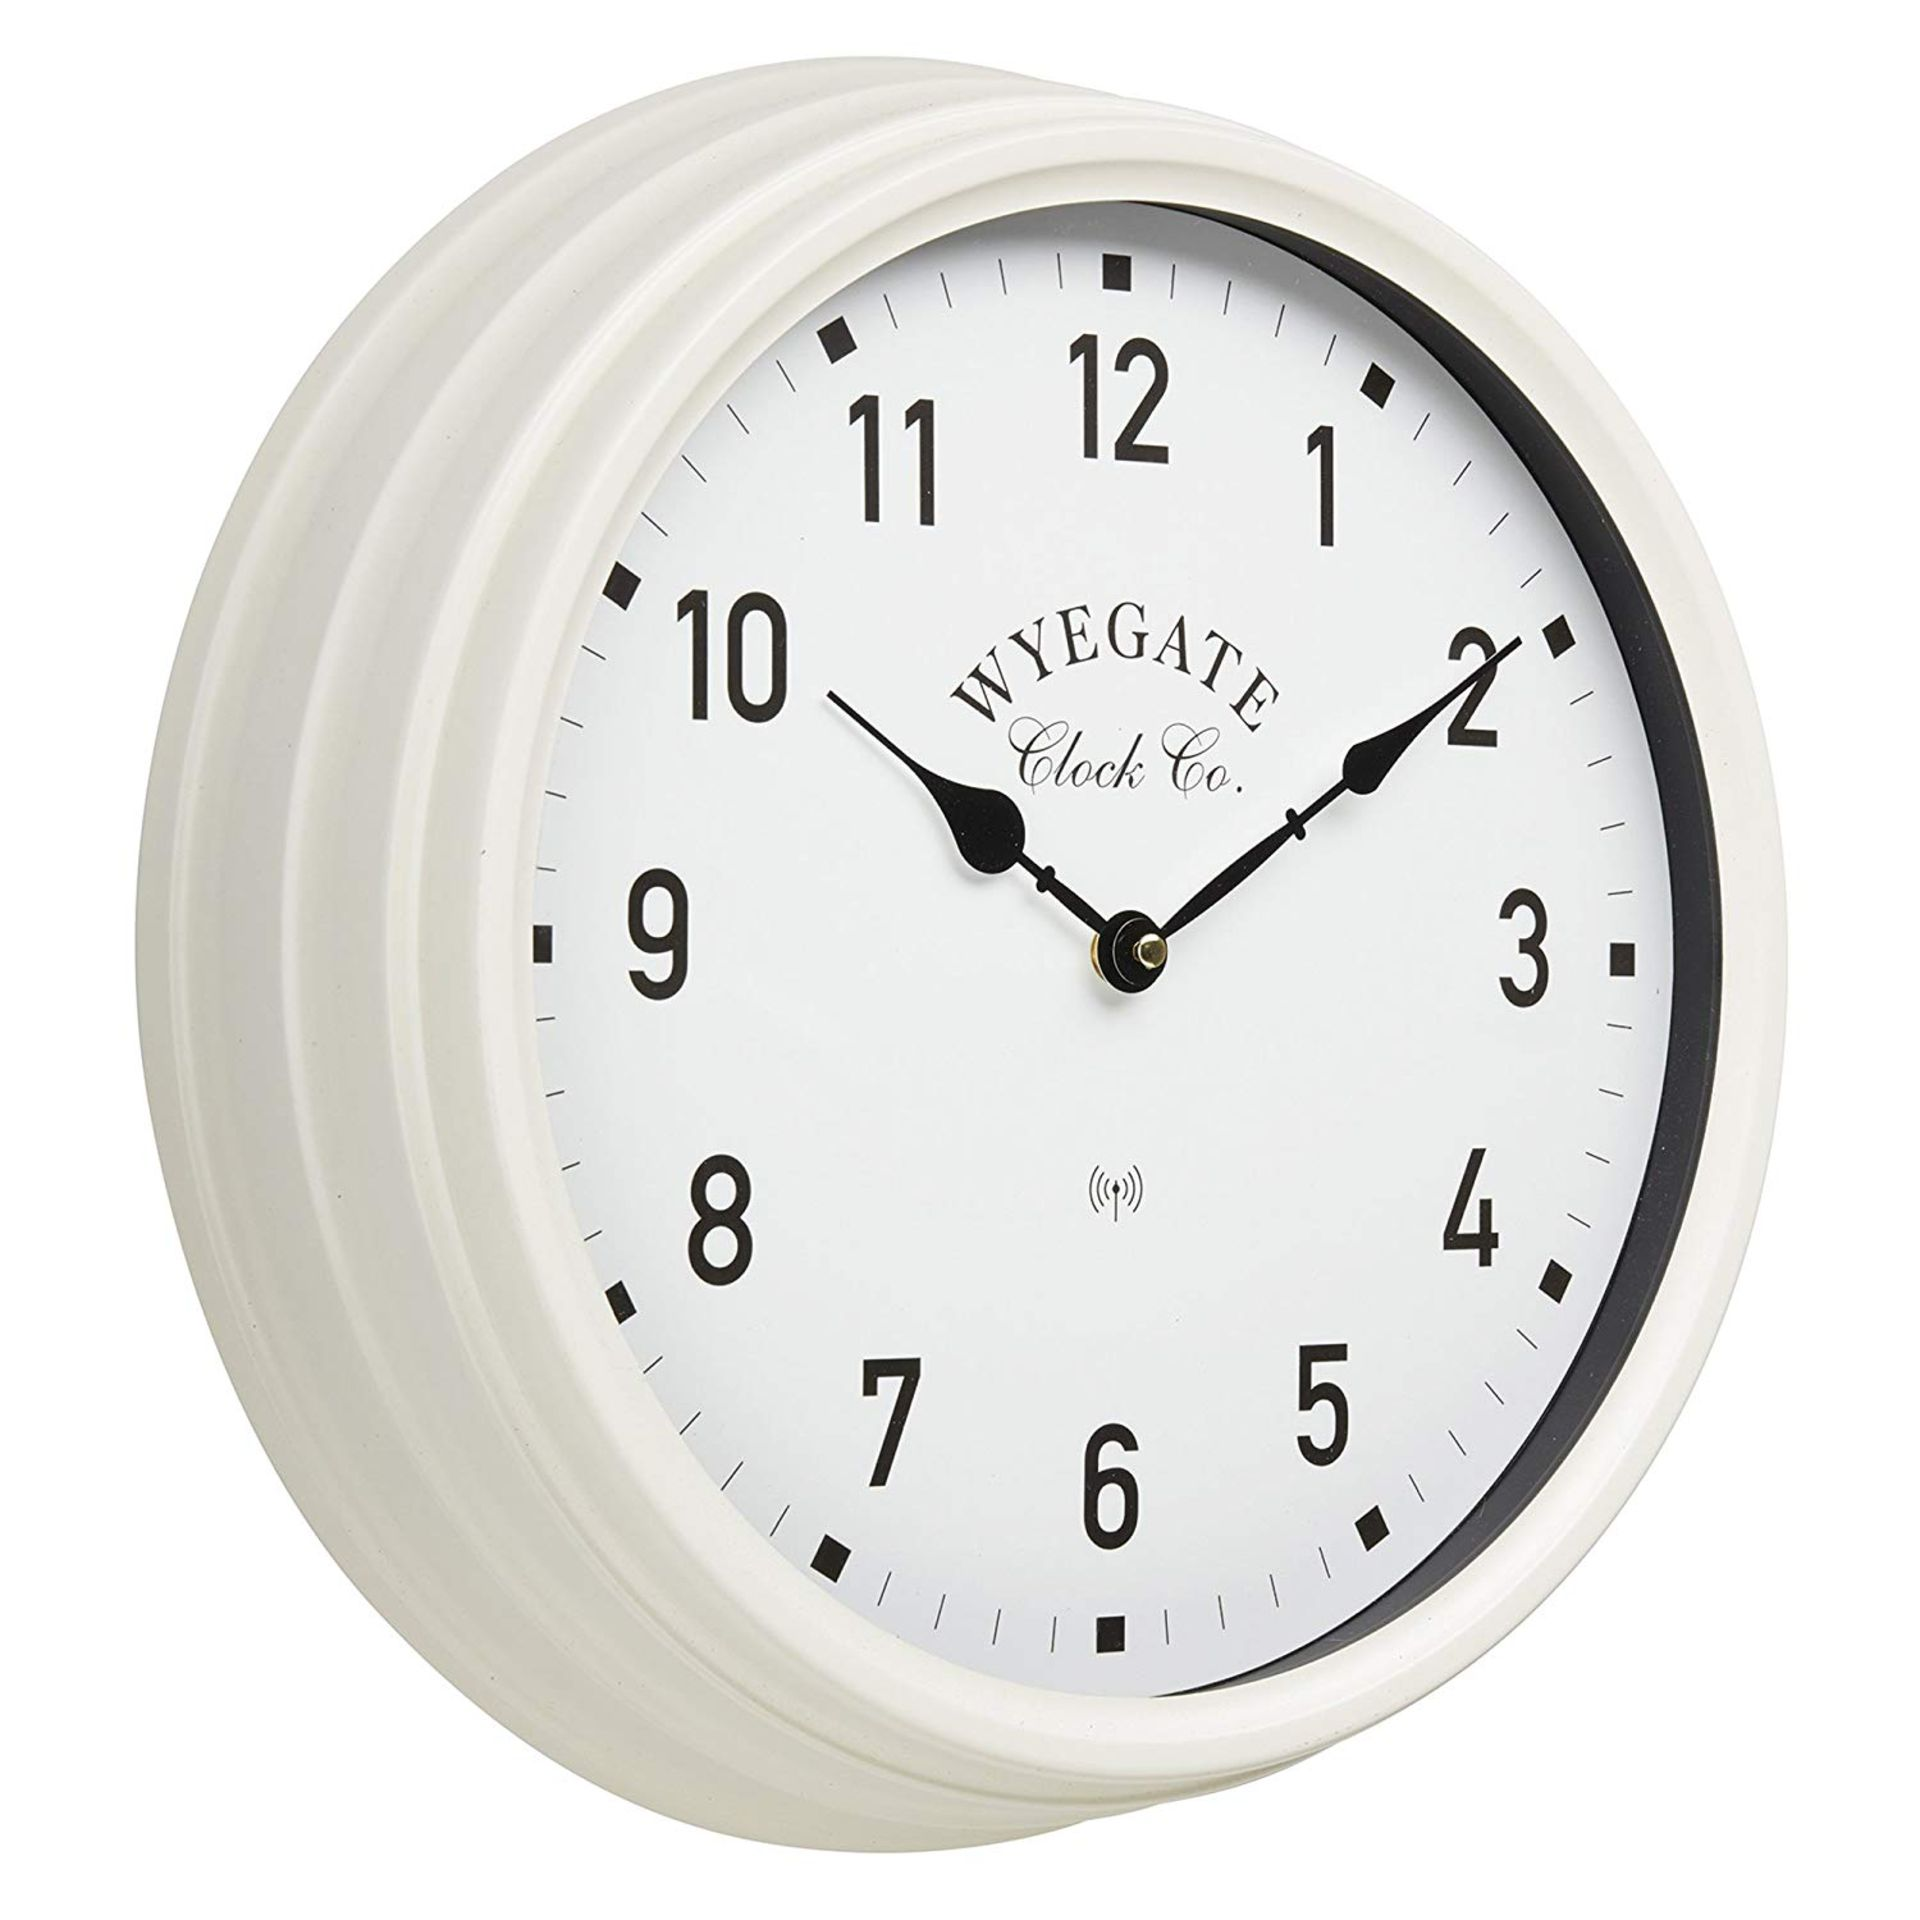 Lot 18100 - V Brand New Big Wyegate Garden/Indoor Clock (Radio Controlled) - 39cm - Cream - RRP £24.99 -